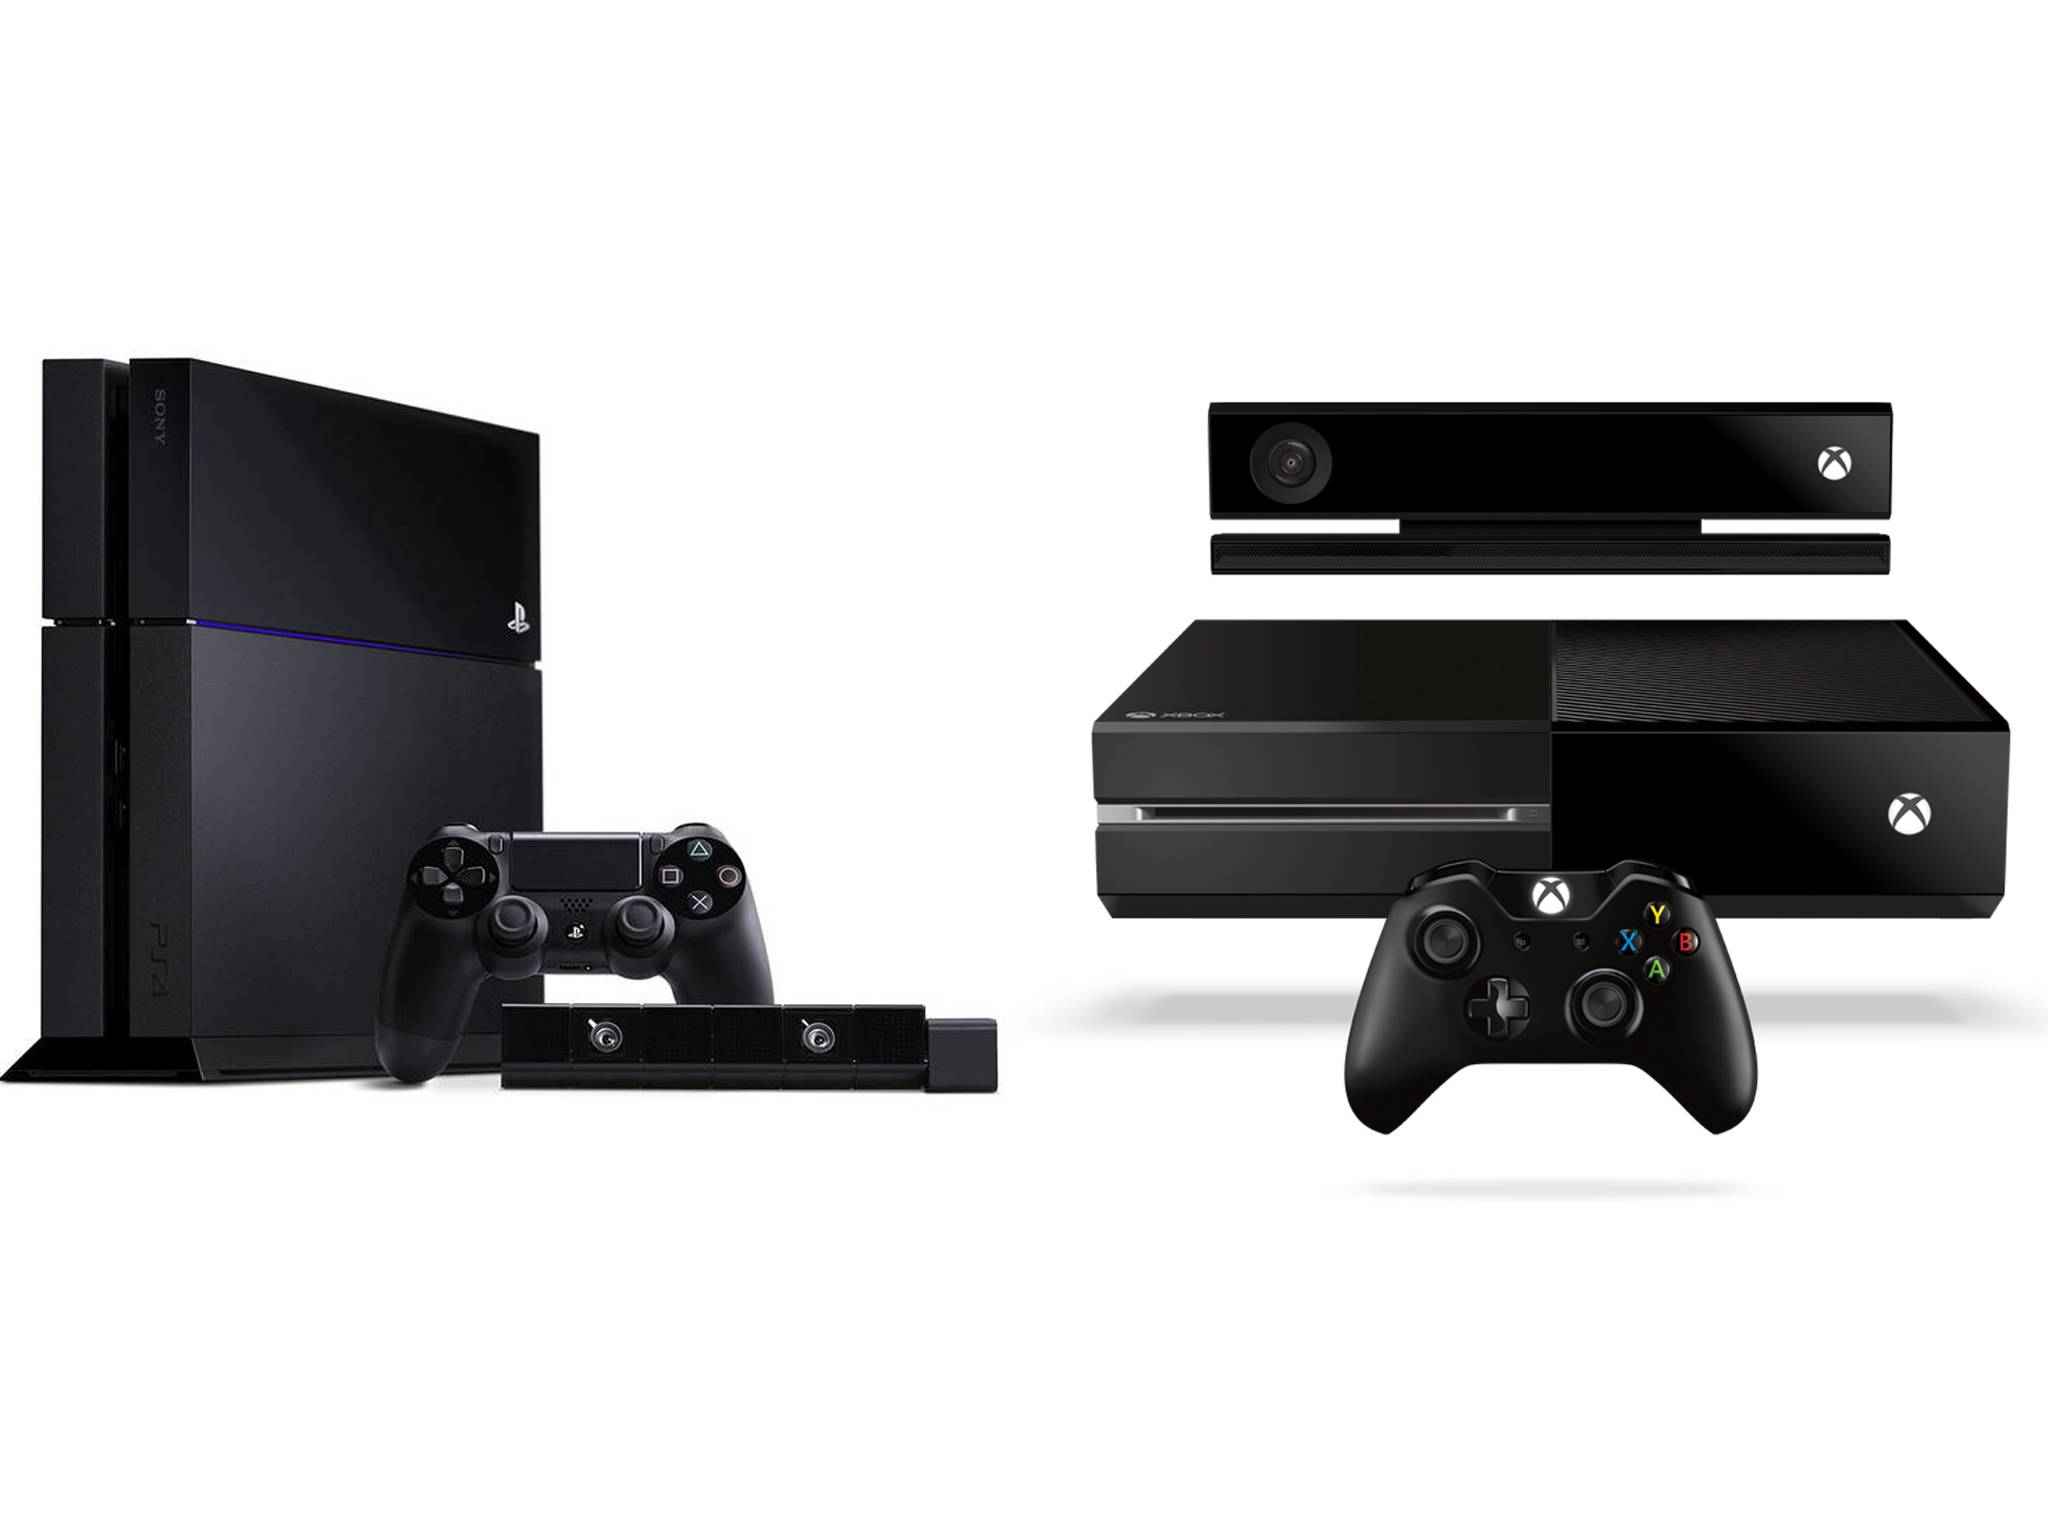 Xbox 1 Vs Ps4 Vs Wii U playground then the Wii U